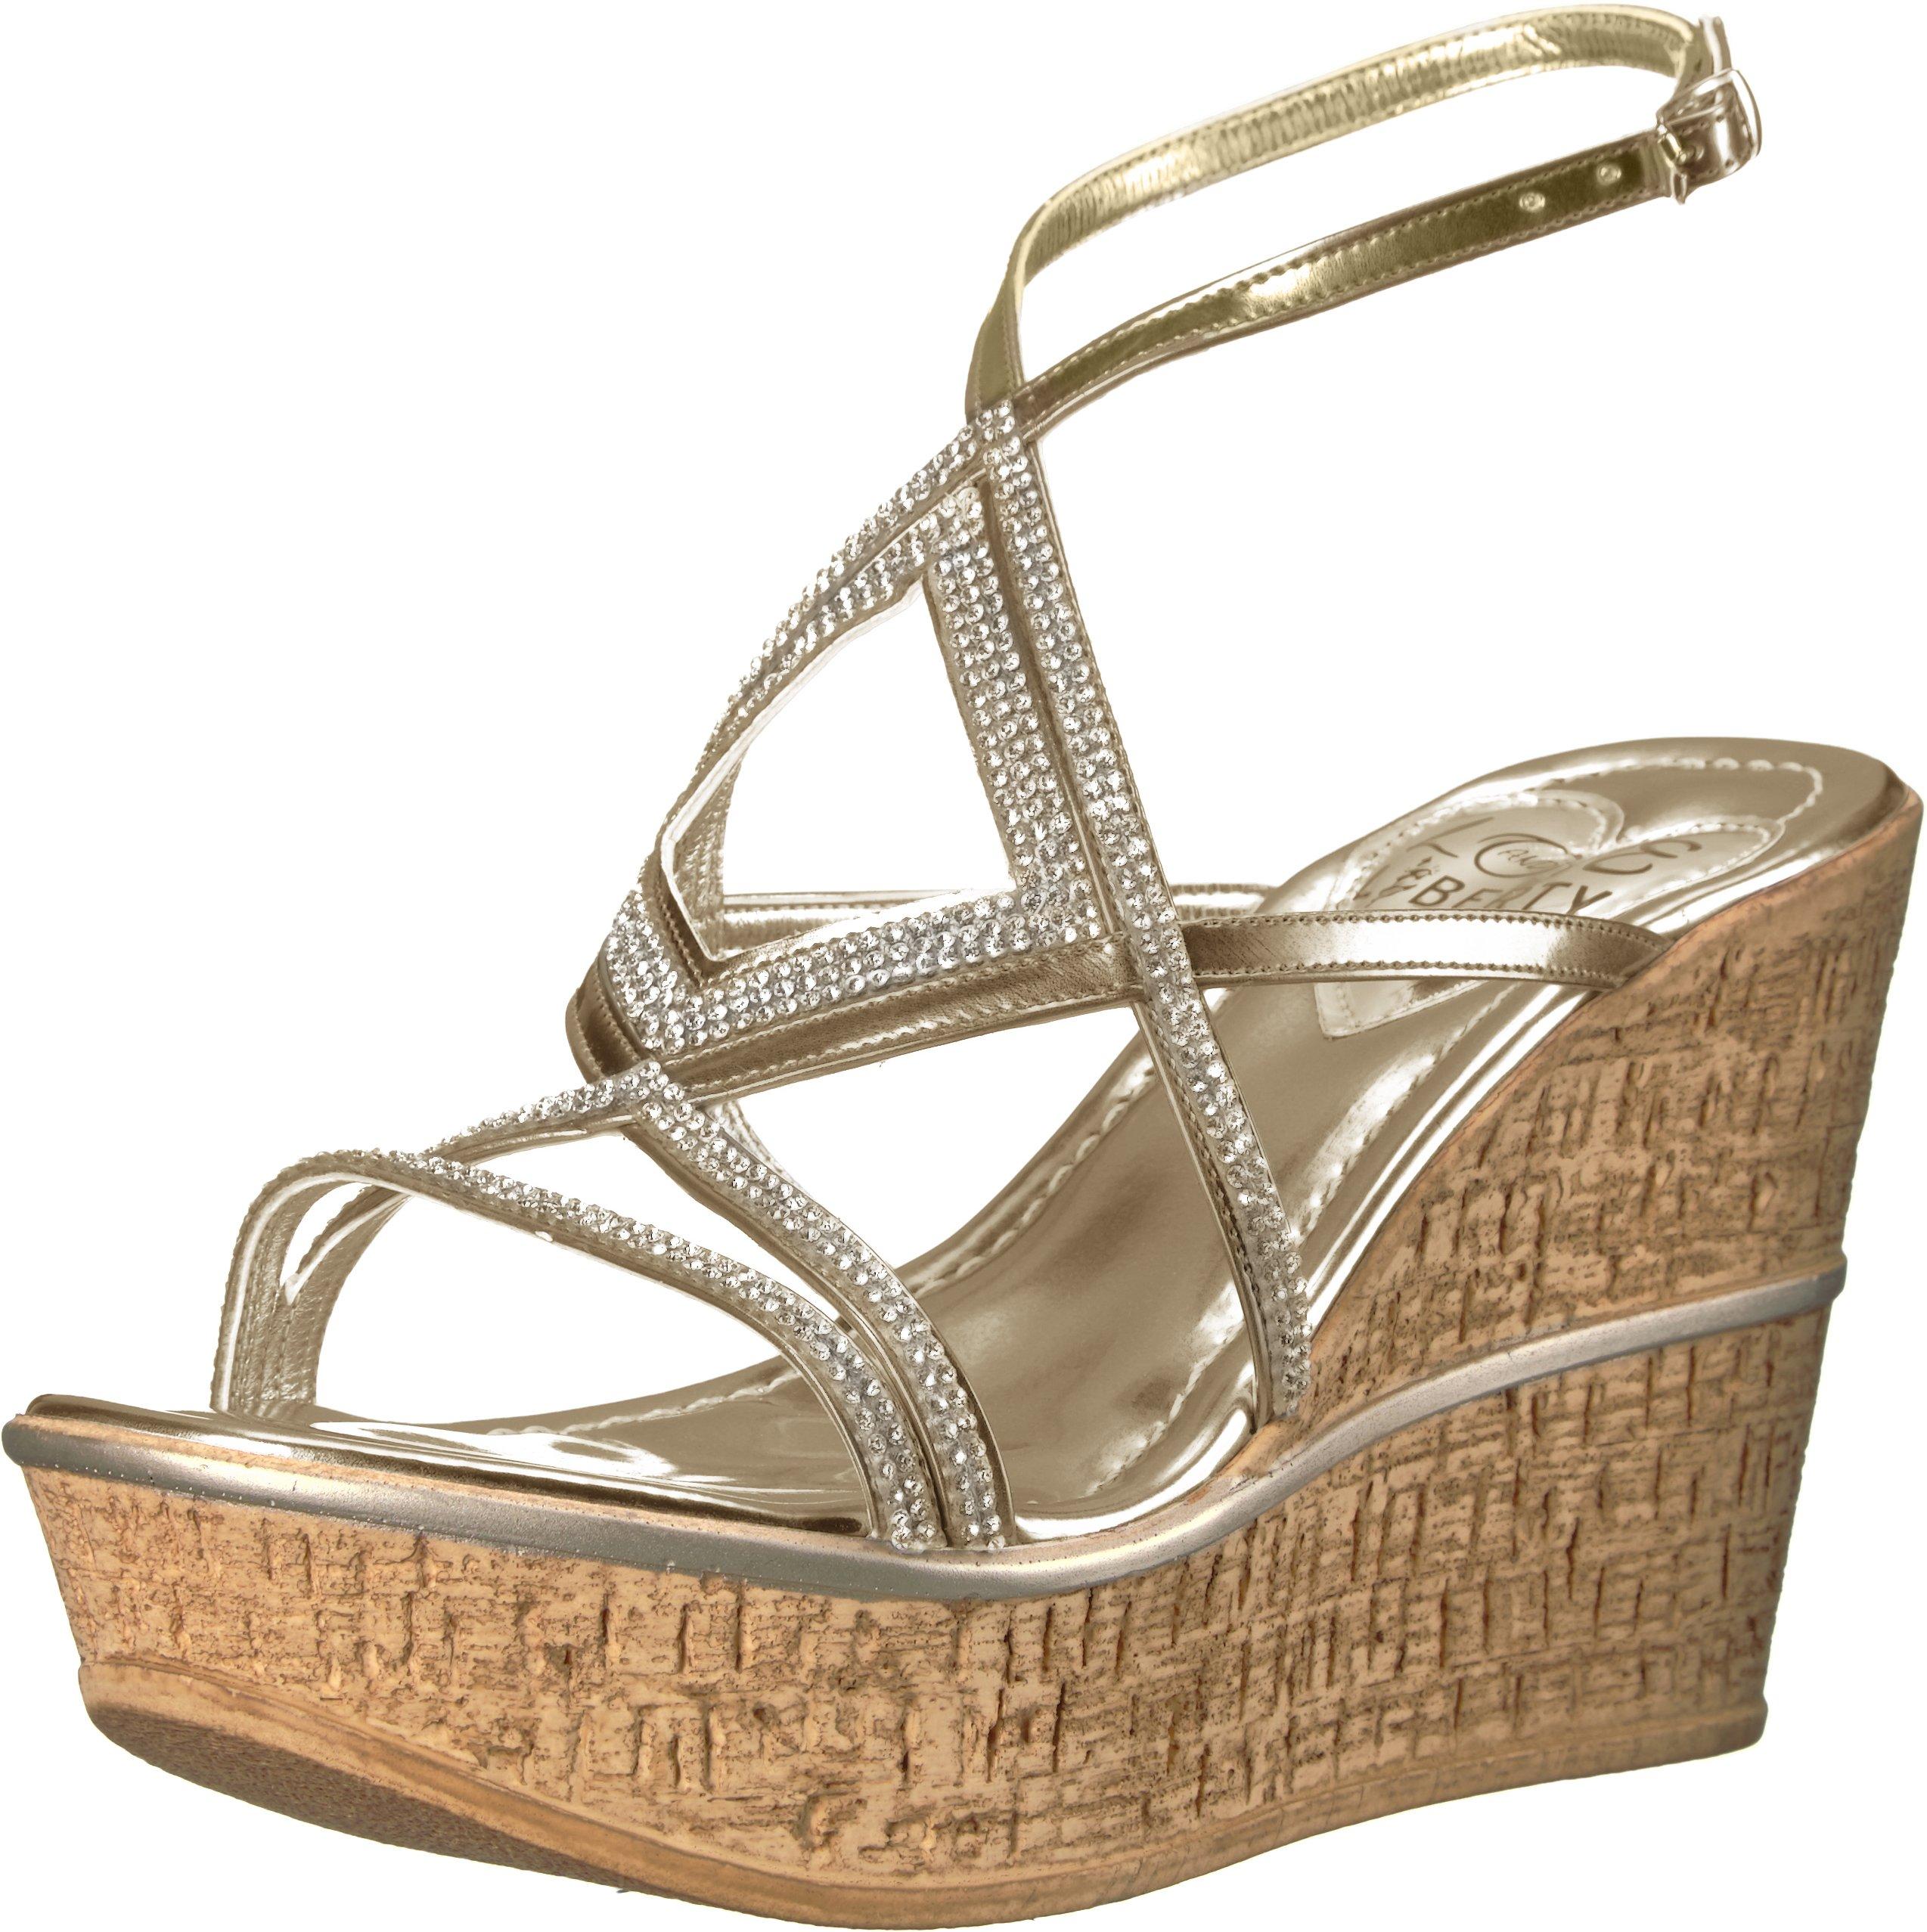 Love & Liberty Women's Selina-Ll Wedge Sandal, Platinum, 9 M US